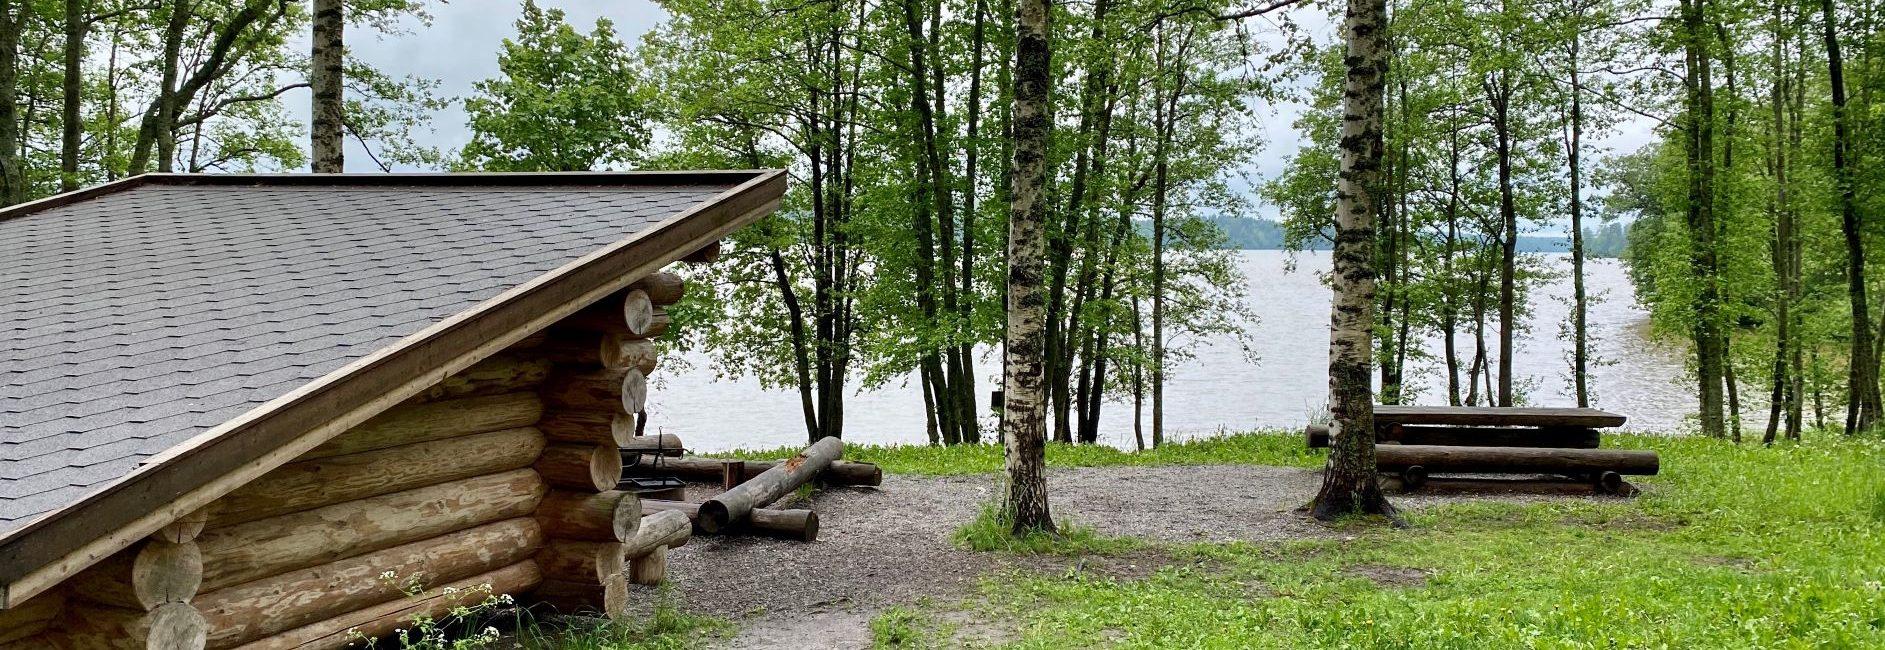 Puumanni lean-to shelter Pääkslahti nature trail